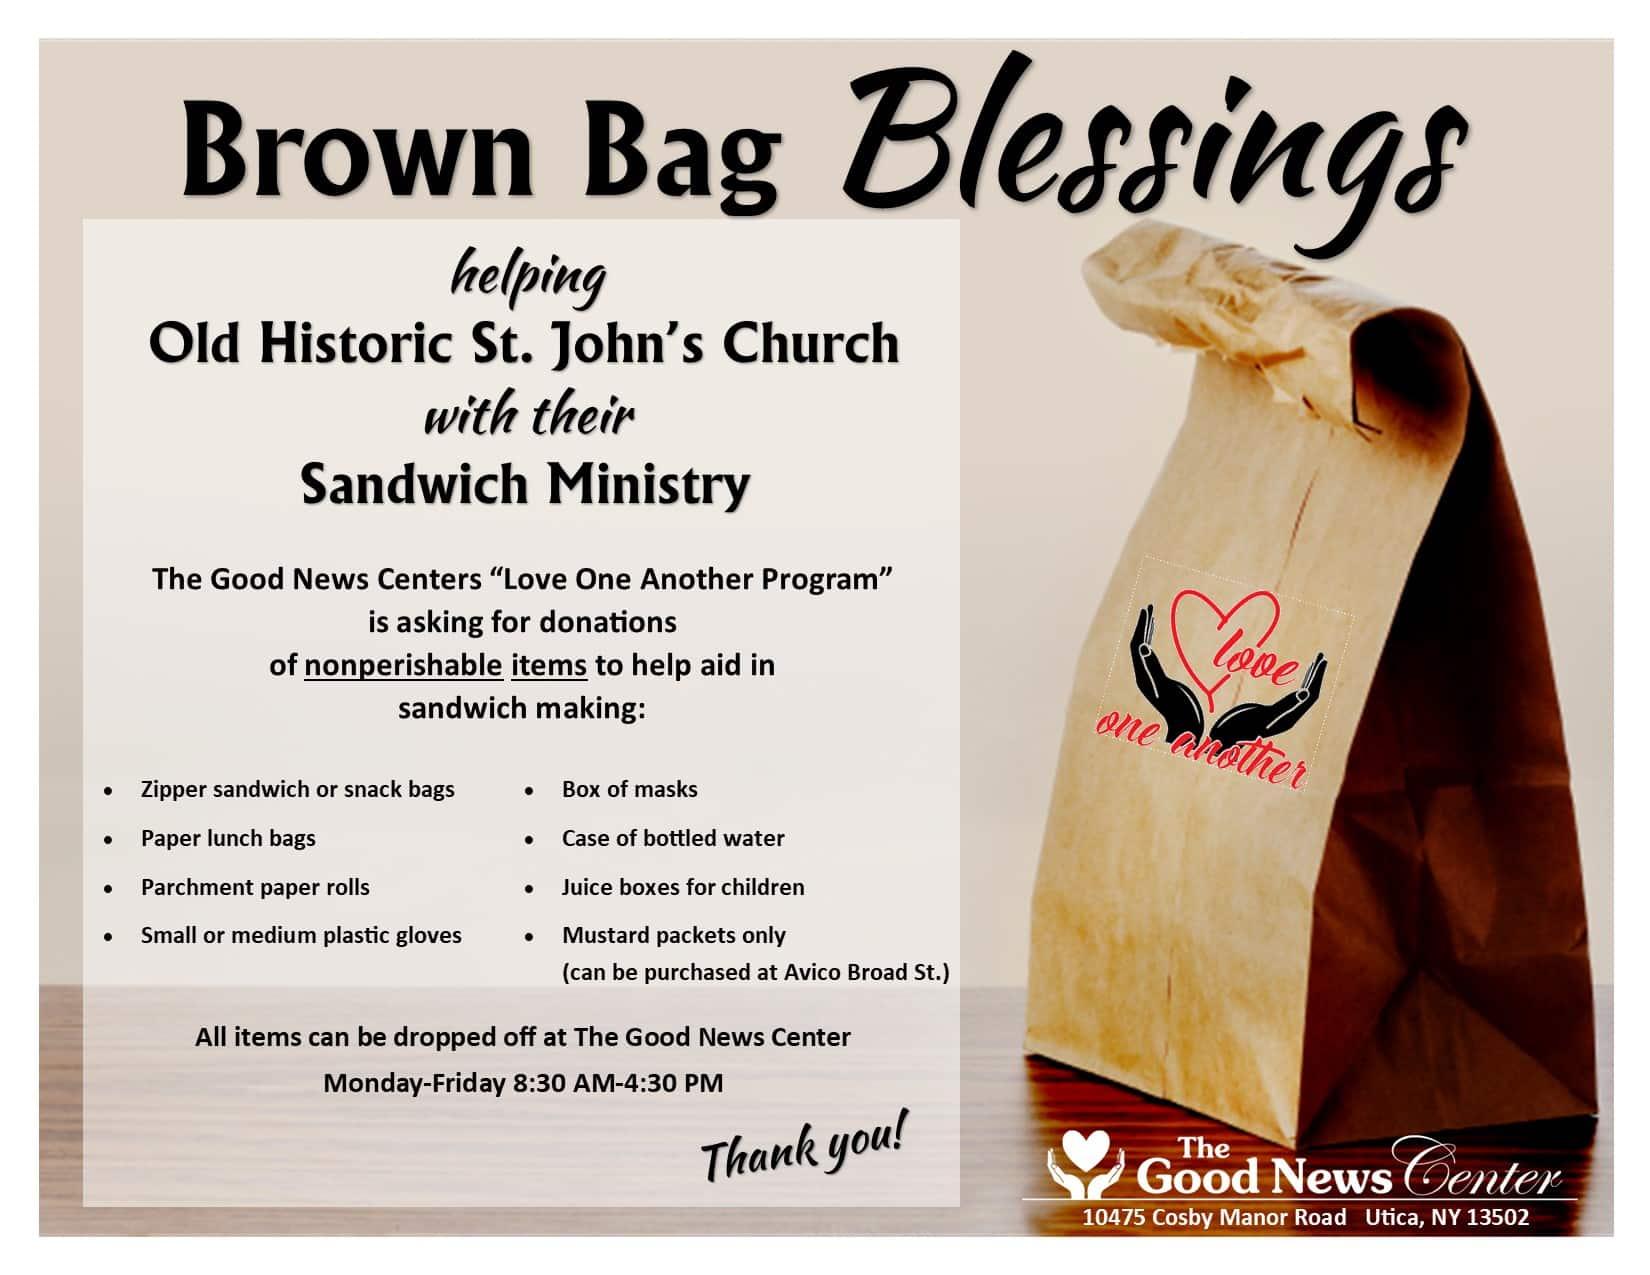 Brown Bag Blessings